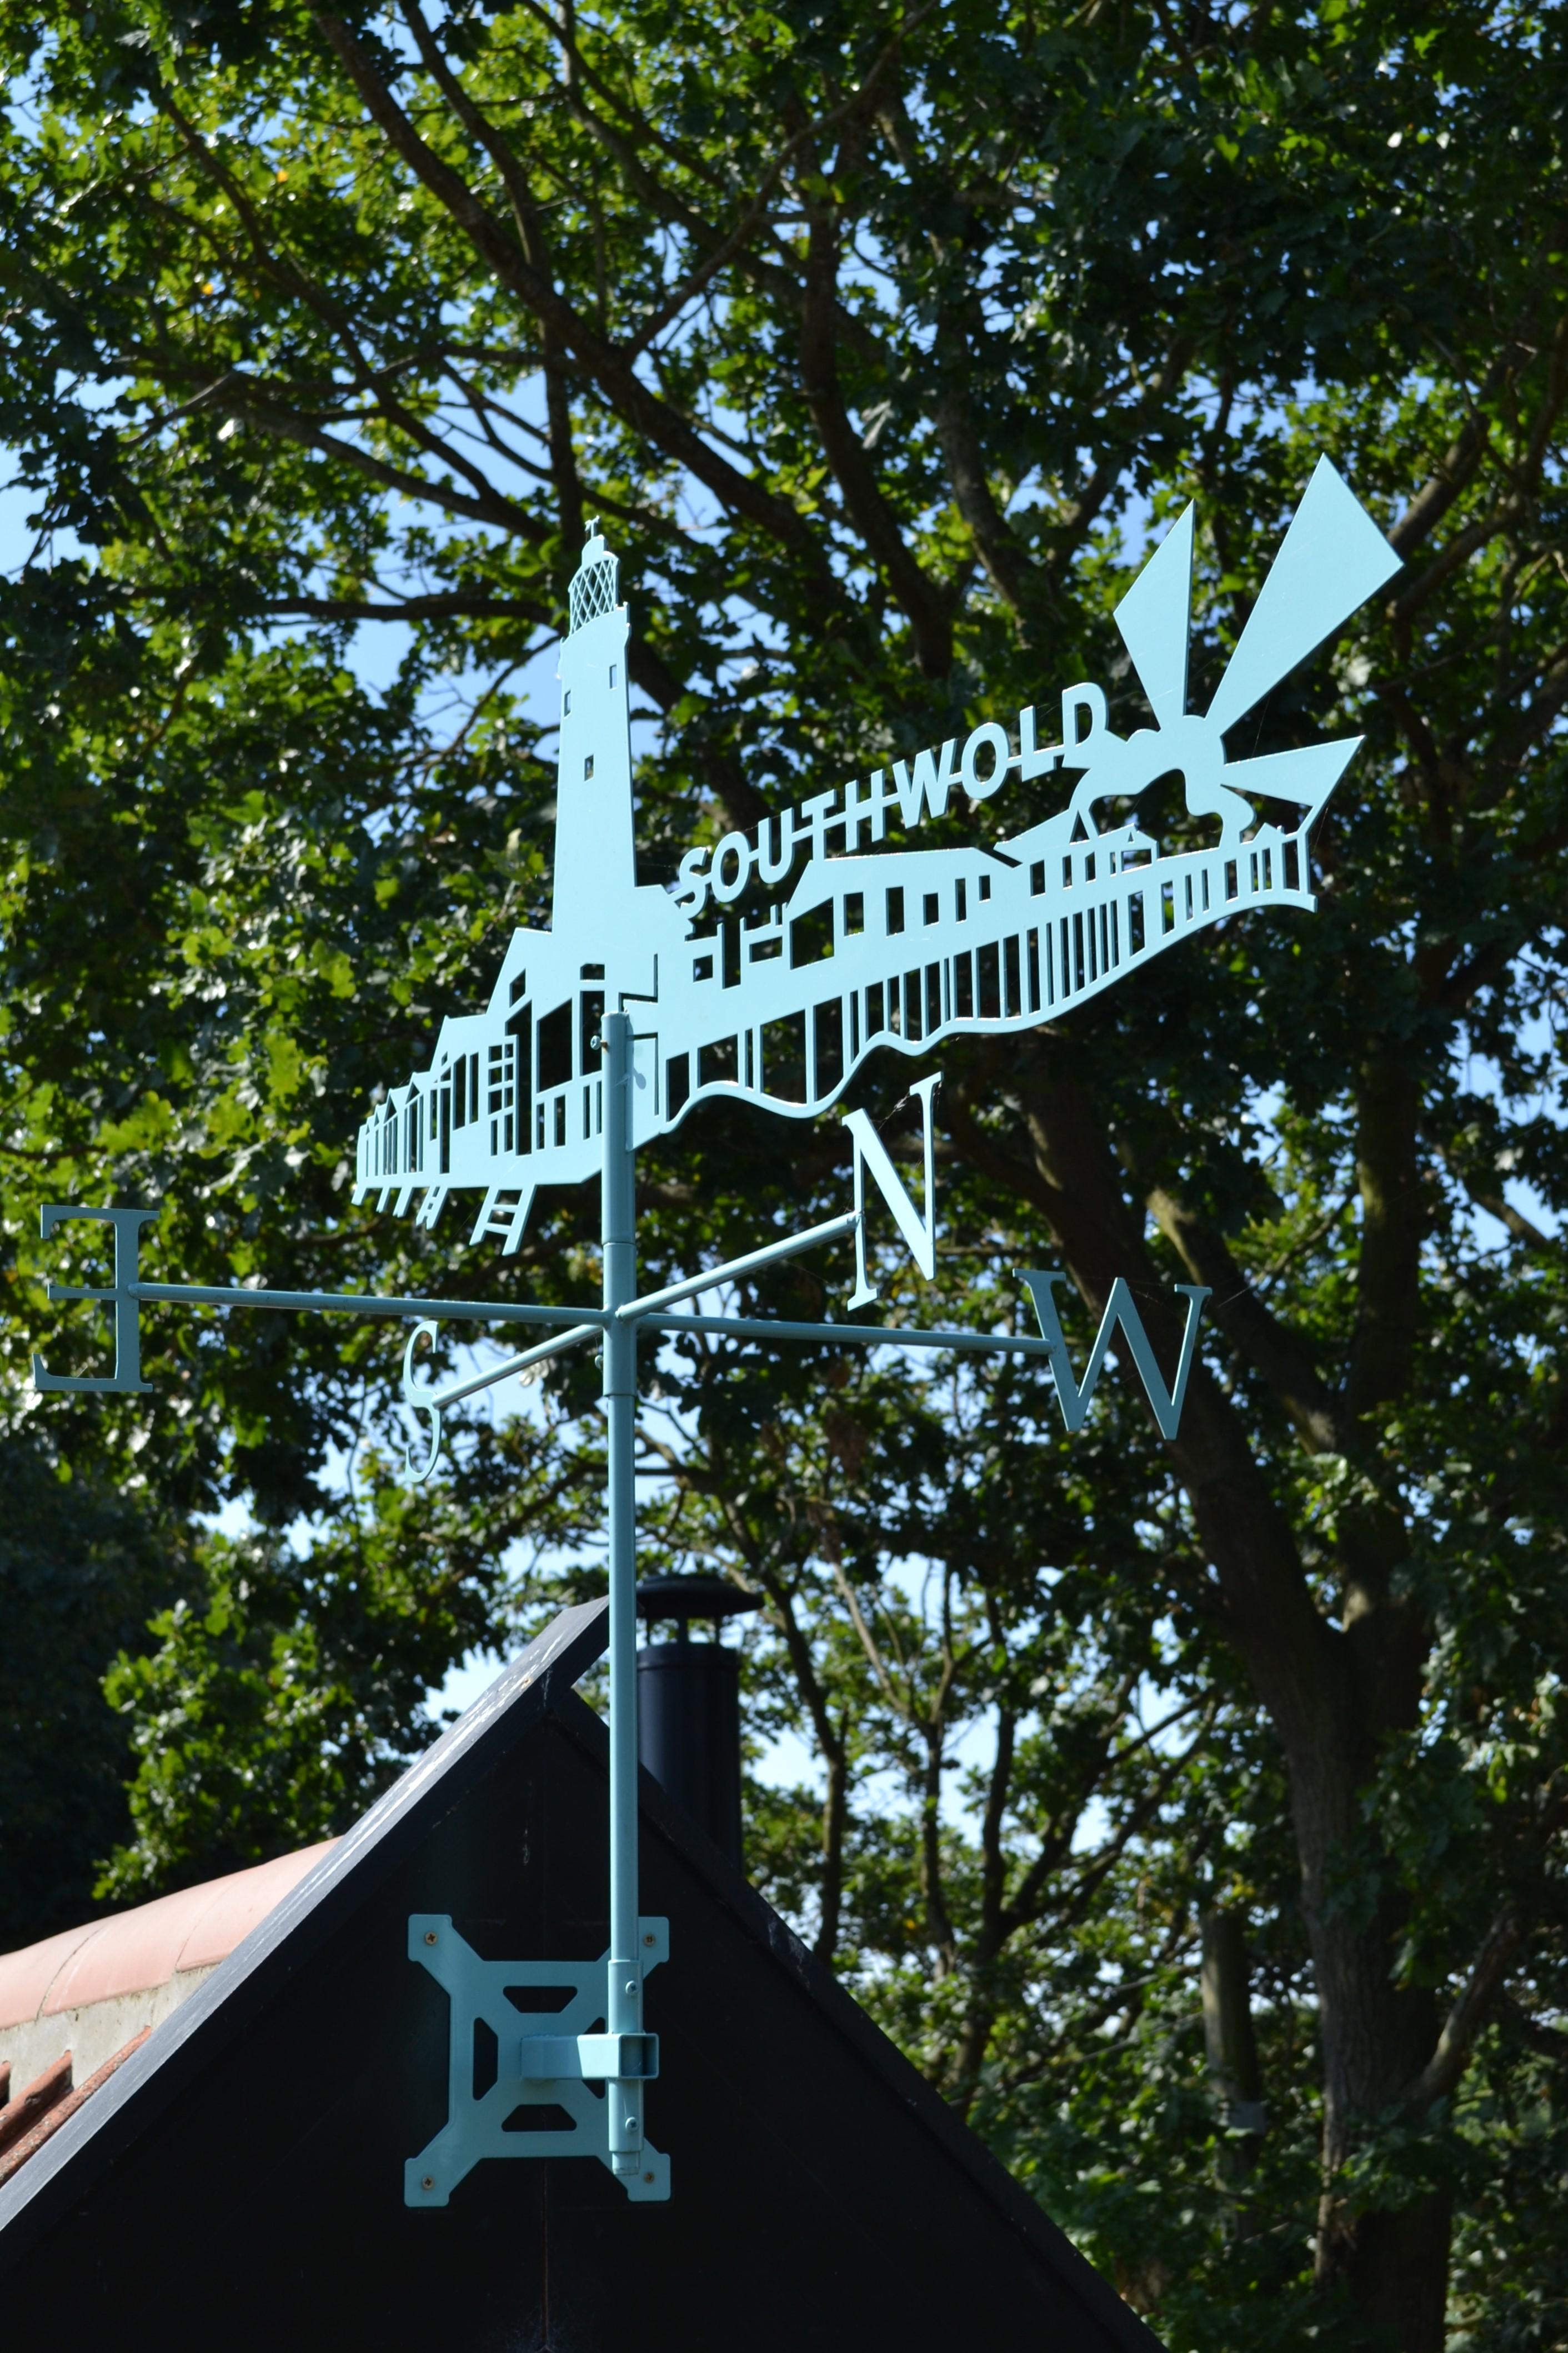 sothwoldwind6